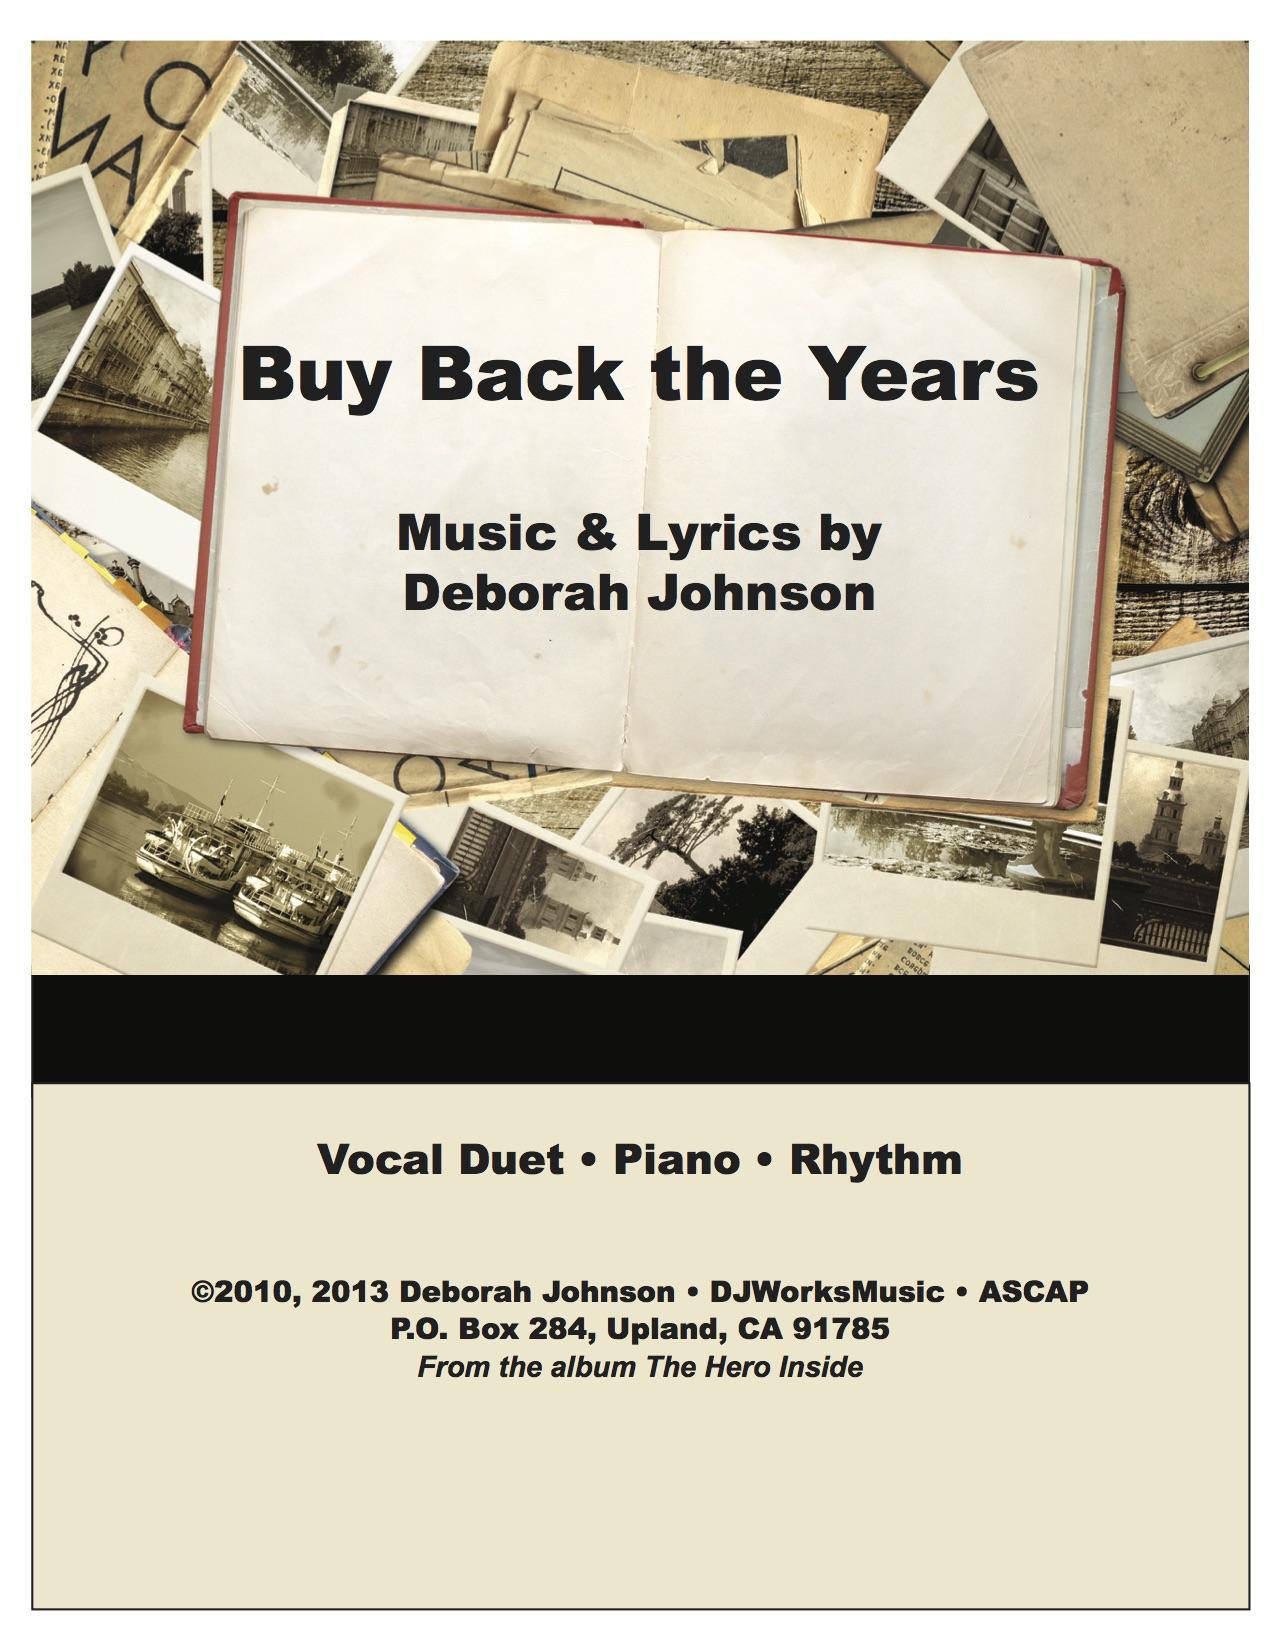 Buy Back the Years-Deborah Johnson